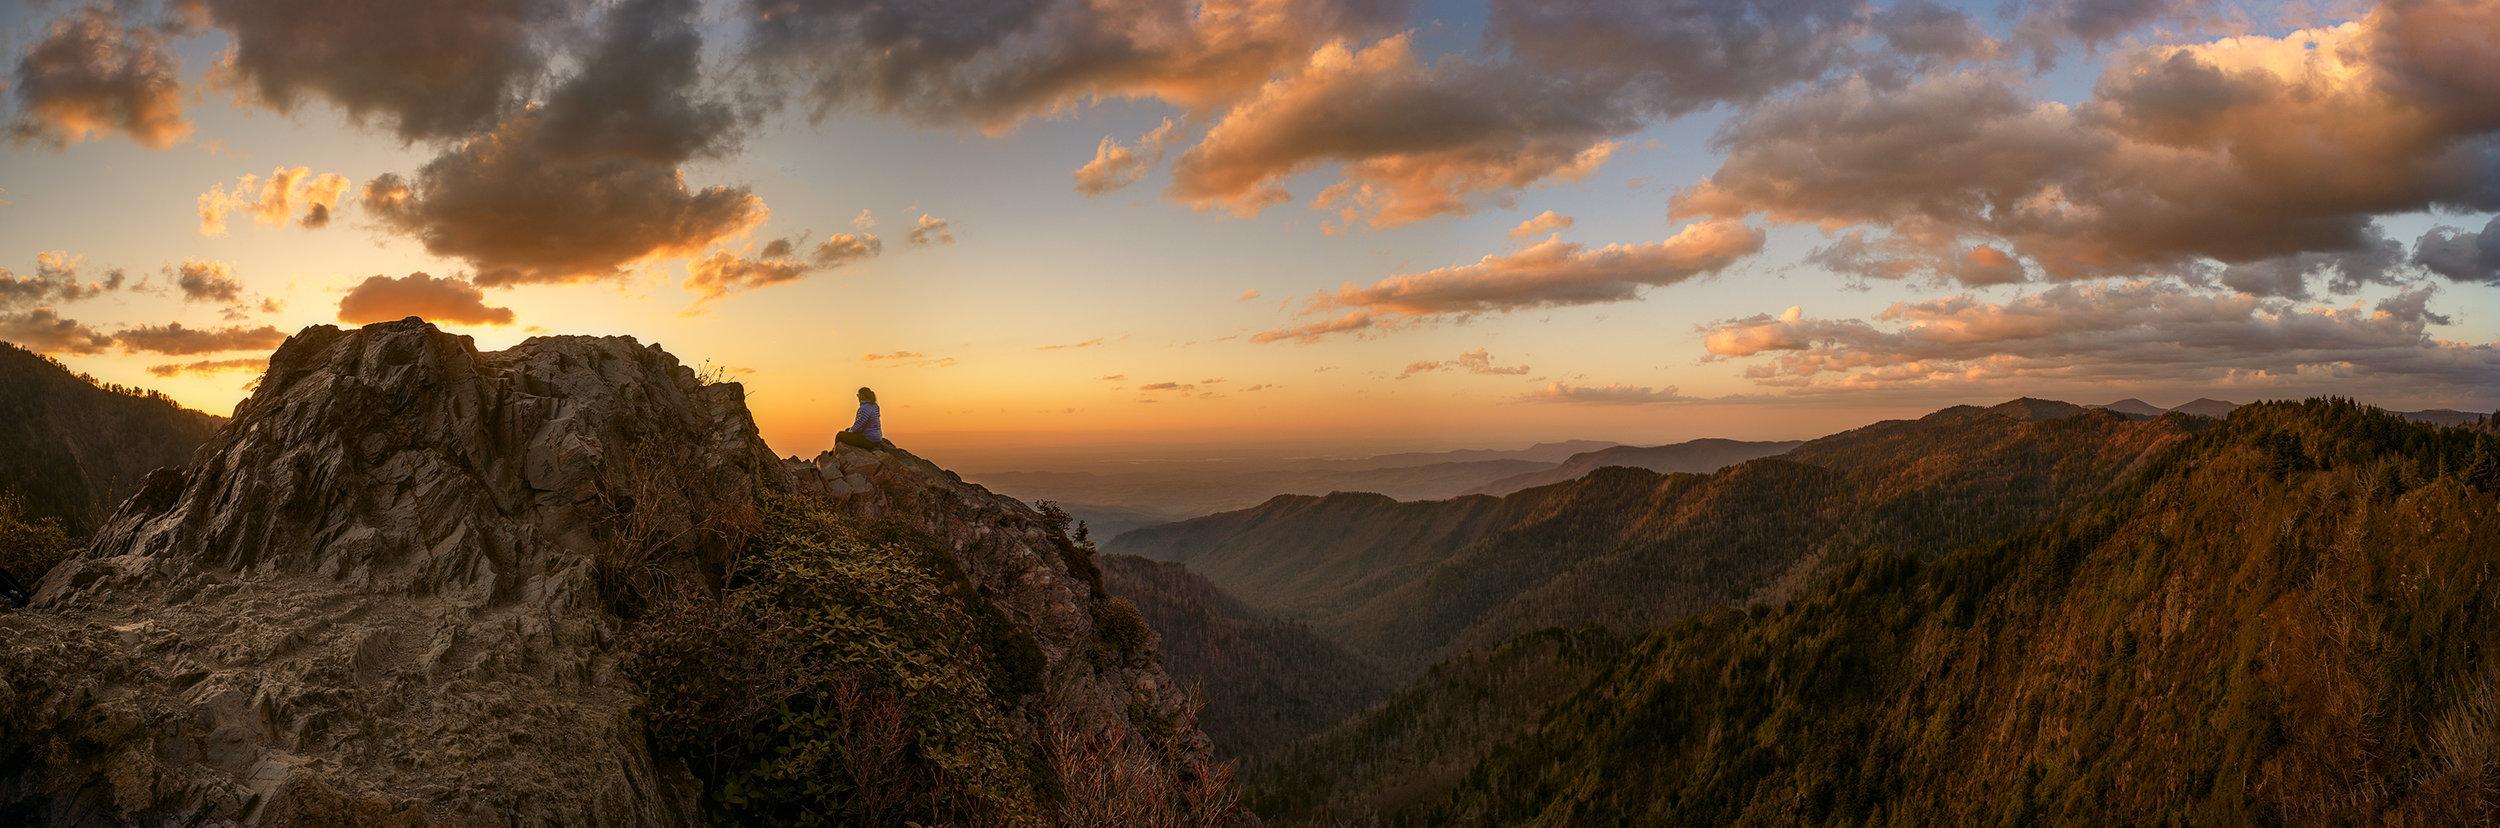 Charlies Bunion on the Appalachian Trail, Smokey Mountains National Park.